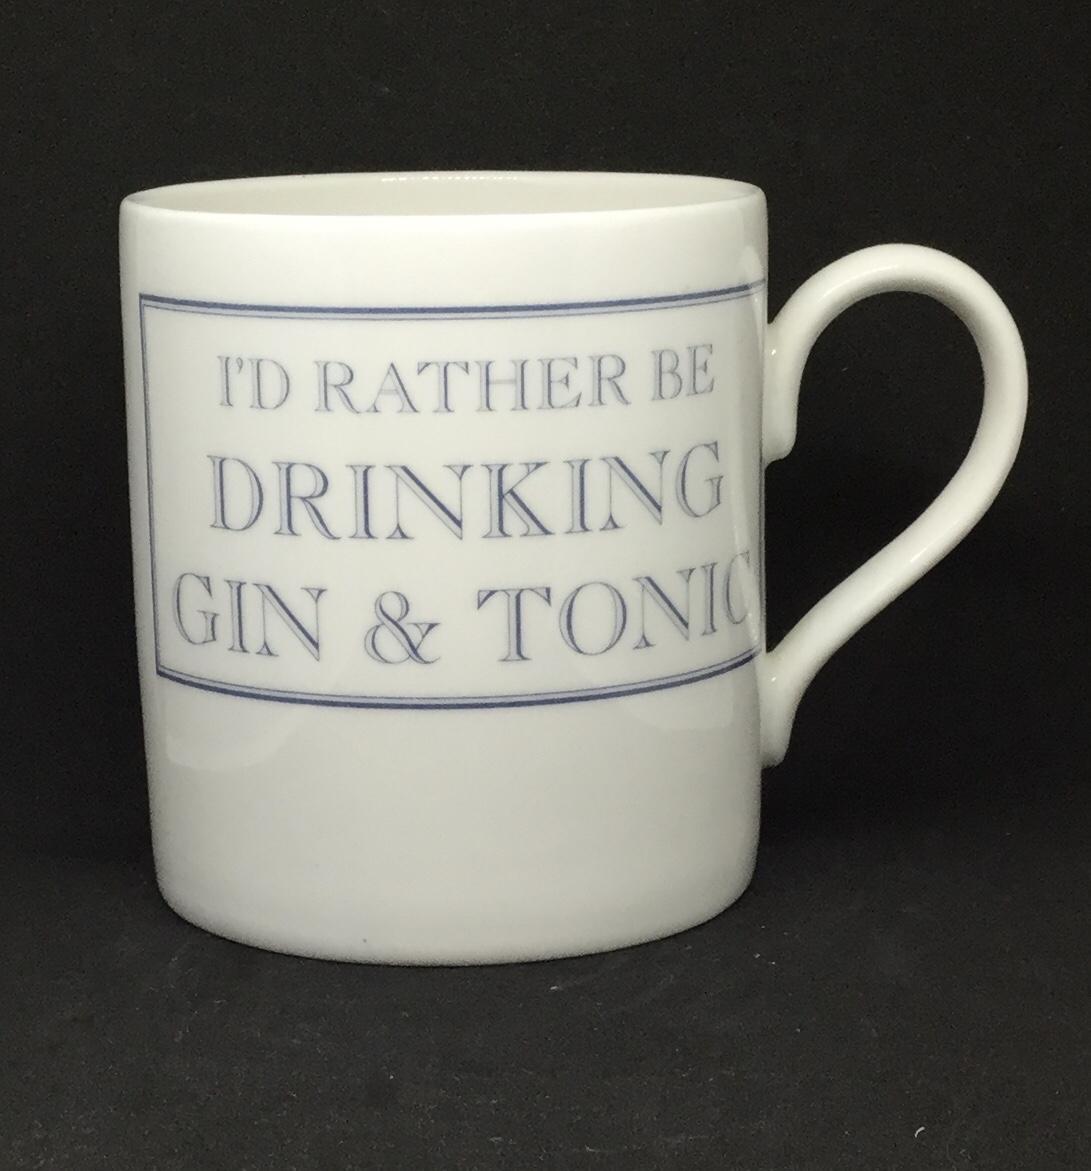 'I'd rather be' drinking gin & tonic mug